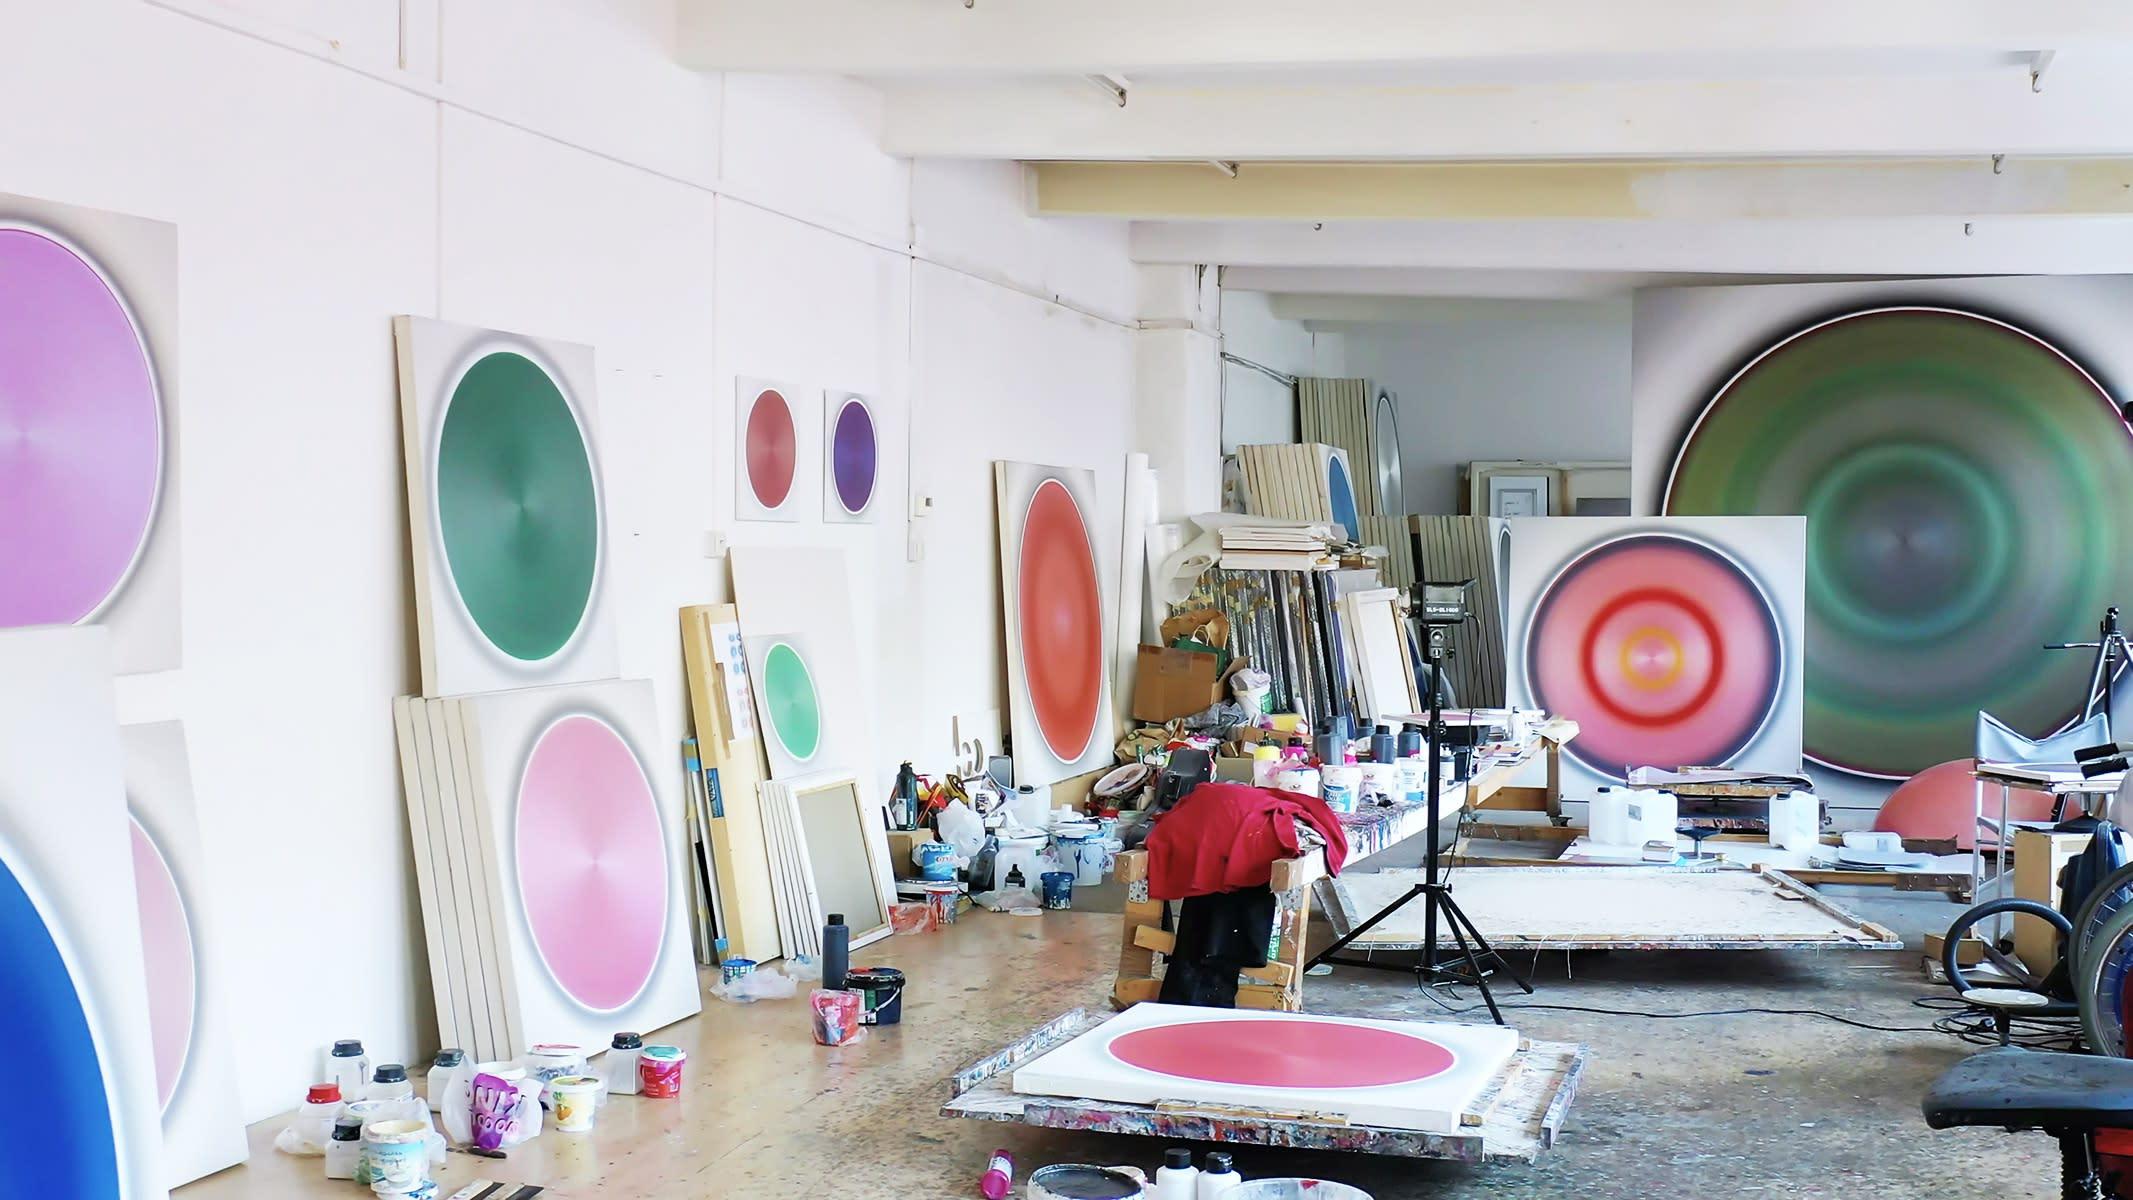 robert schaberl, studio, artist, artworks on wall, munchies art club